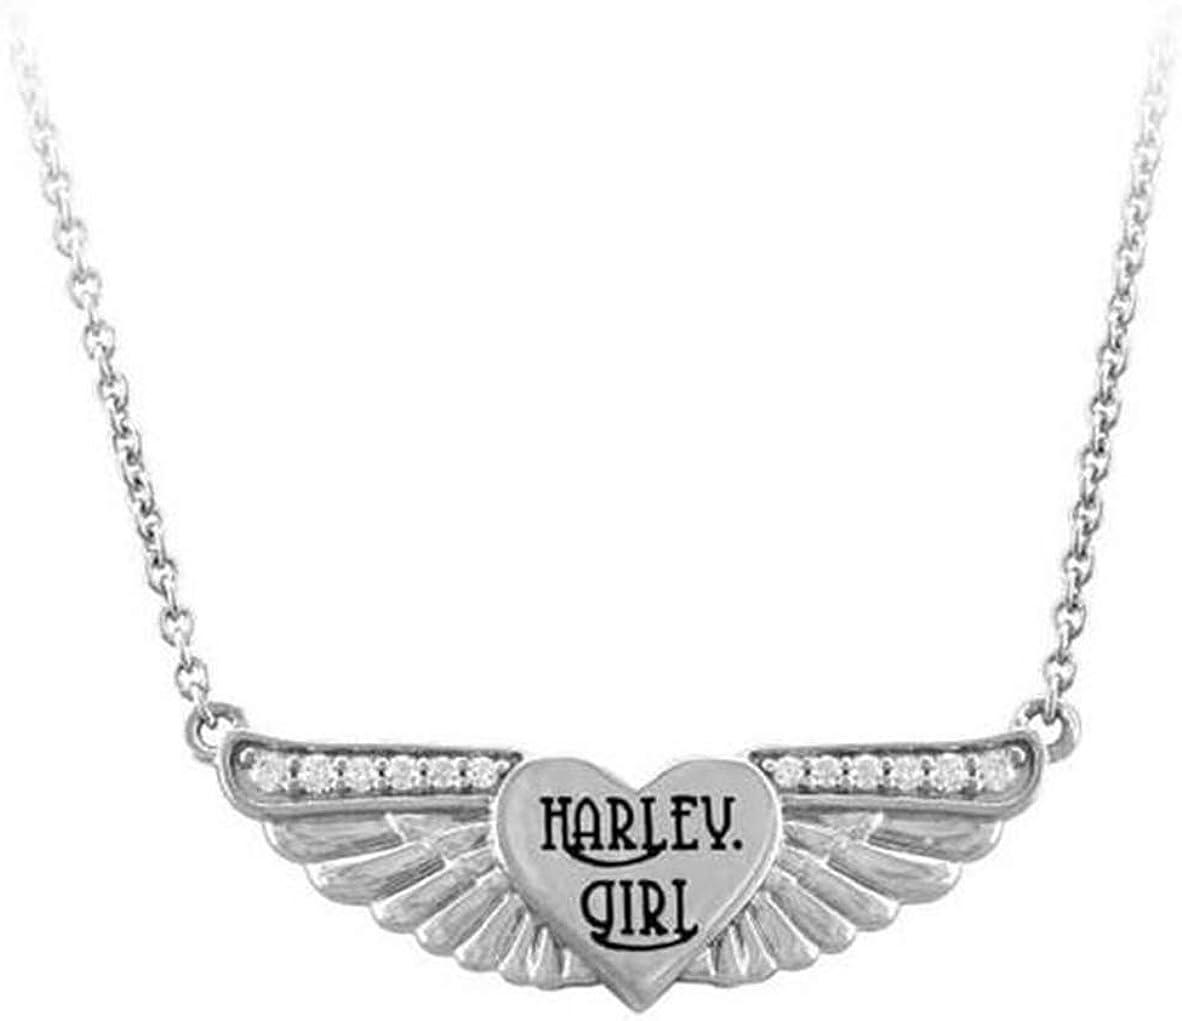 10+ Wholesale harley davidson jewelry in bulk ideas in 2021